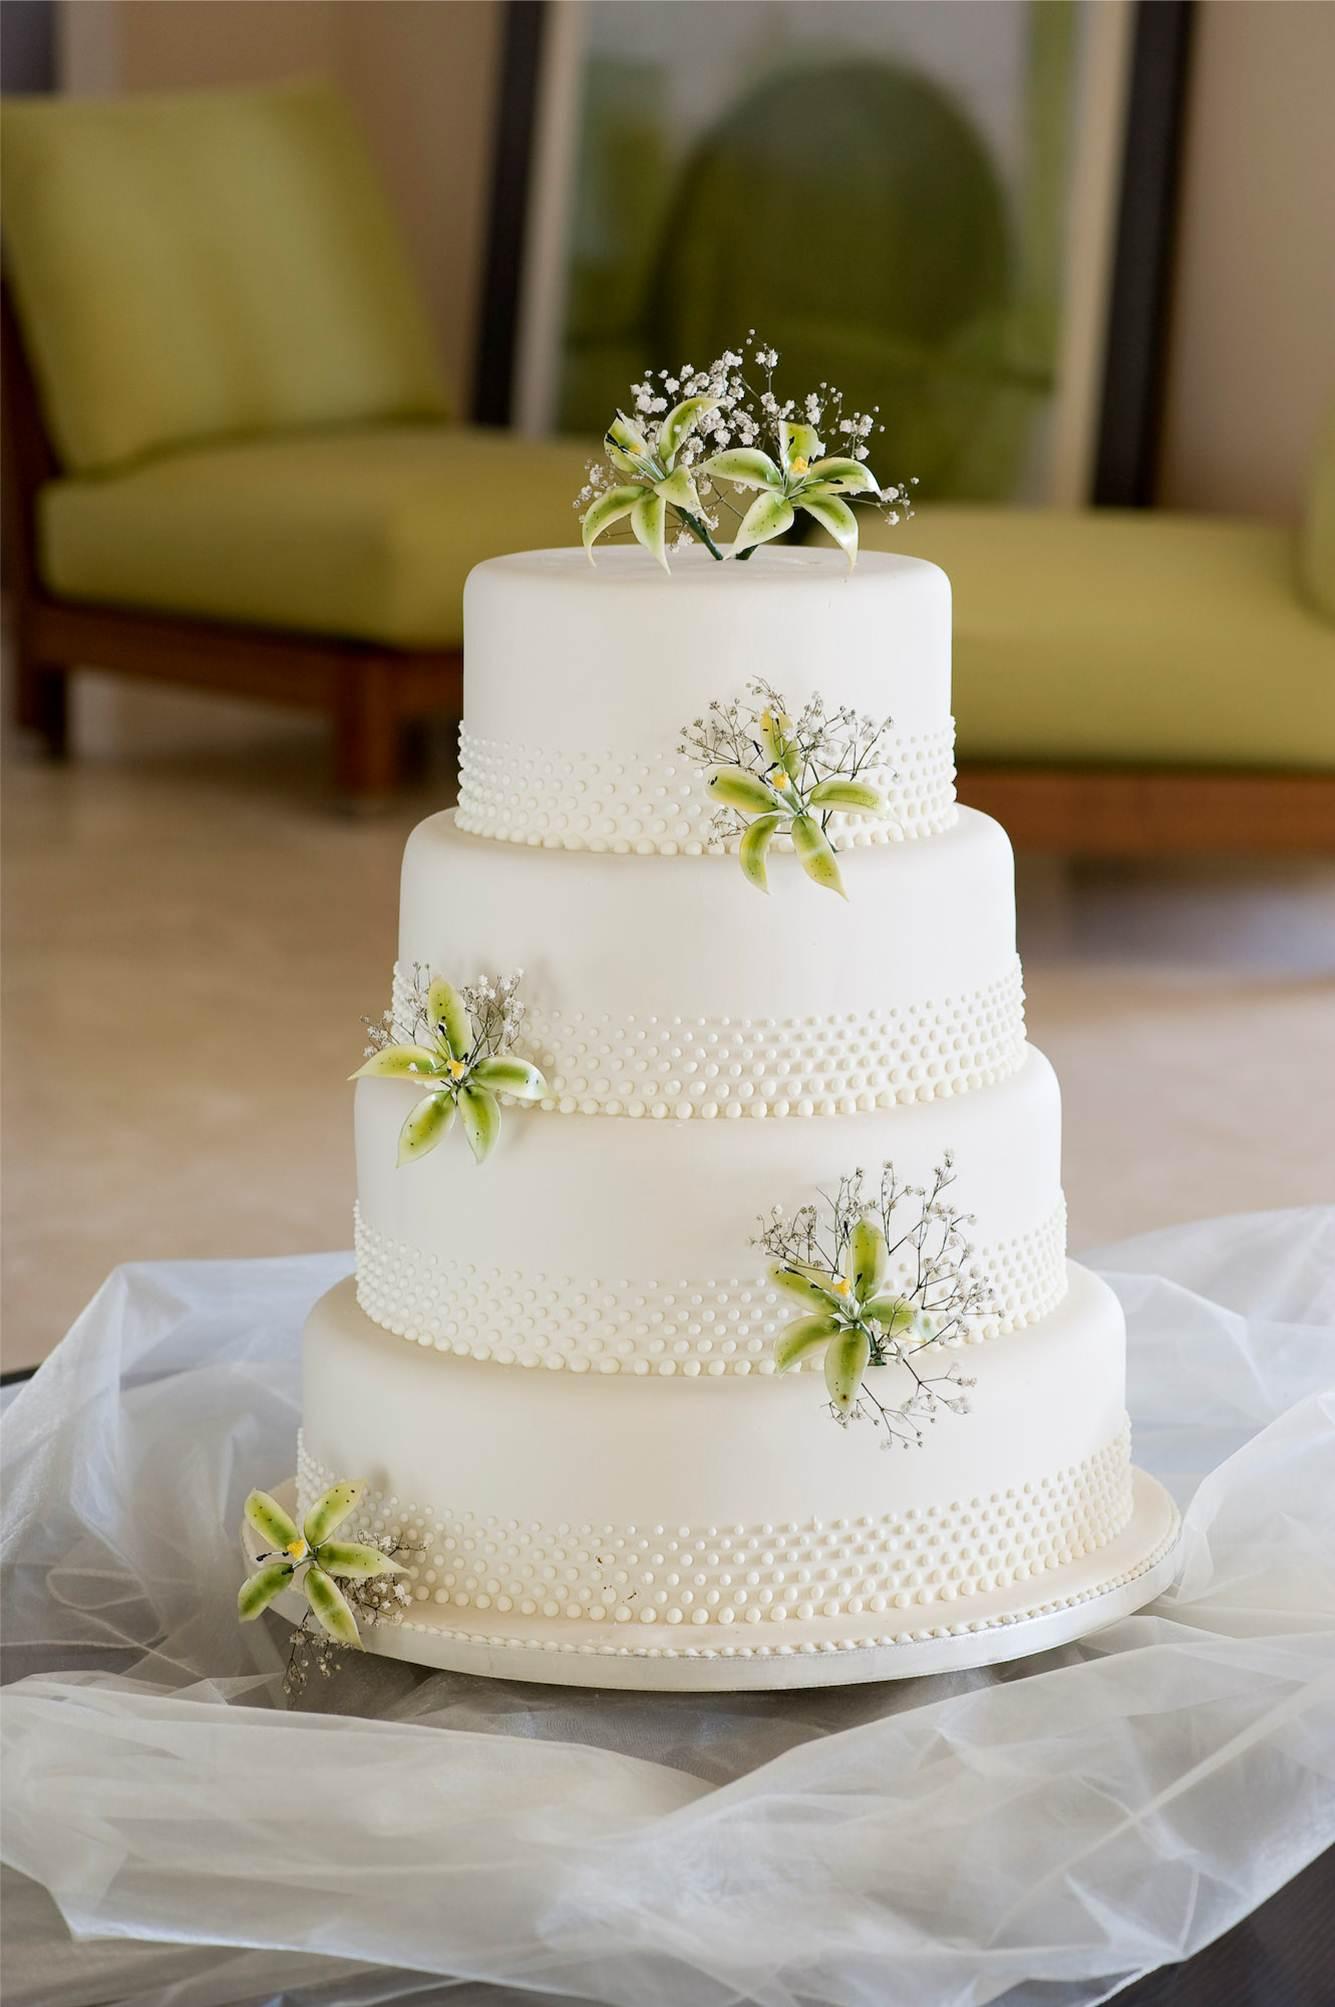 weddings in malta wedding cakes 8 weddings in malta wedding planners in malta. Black Bedroom Furniture Sets. Home Design Ideas